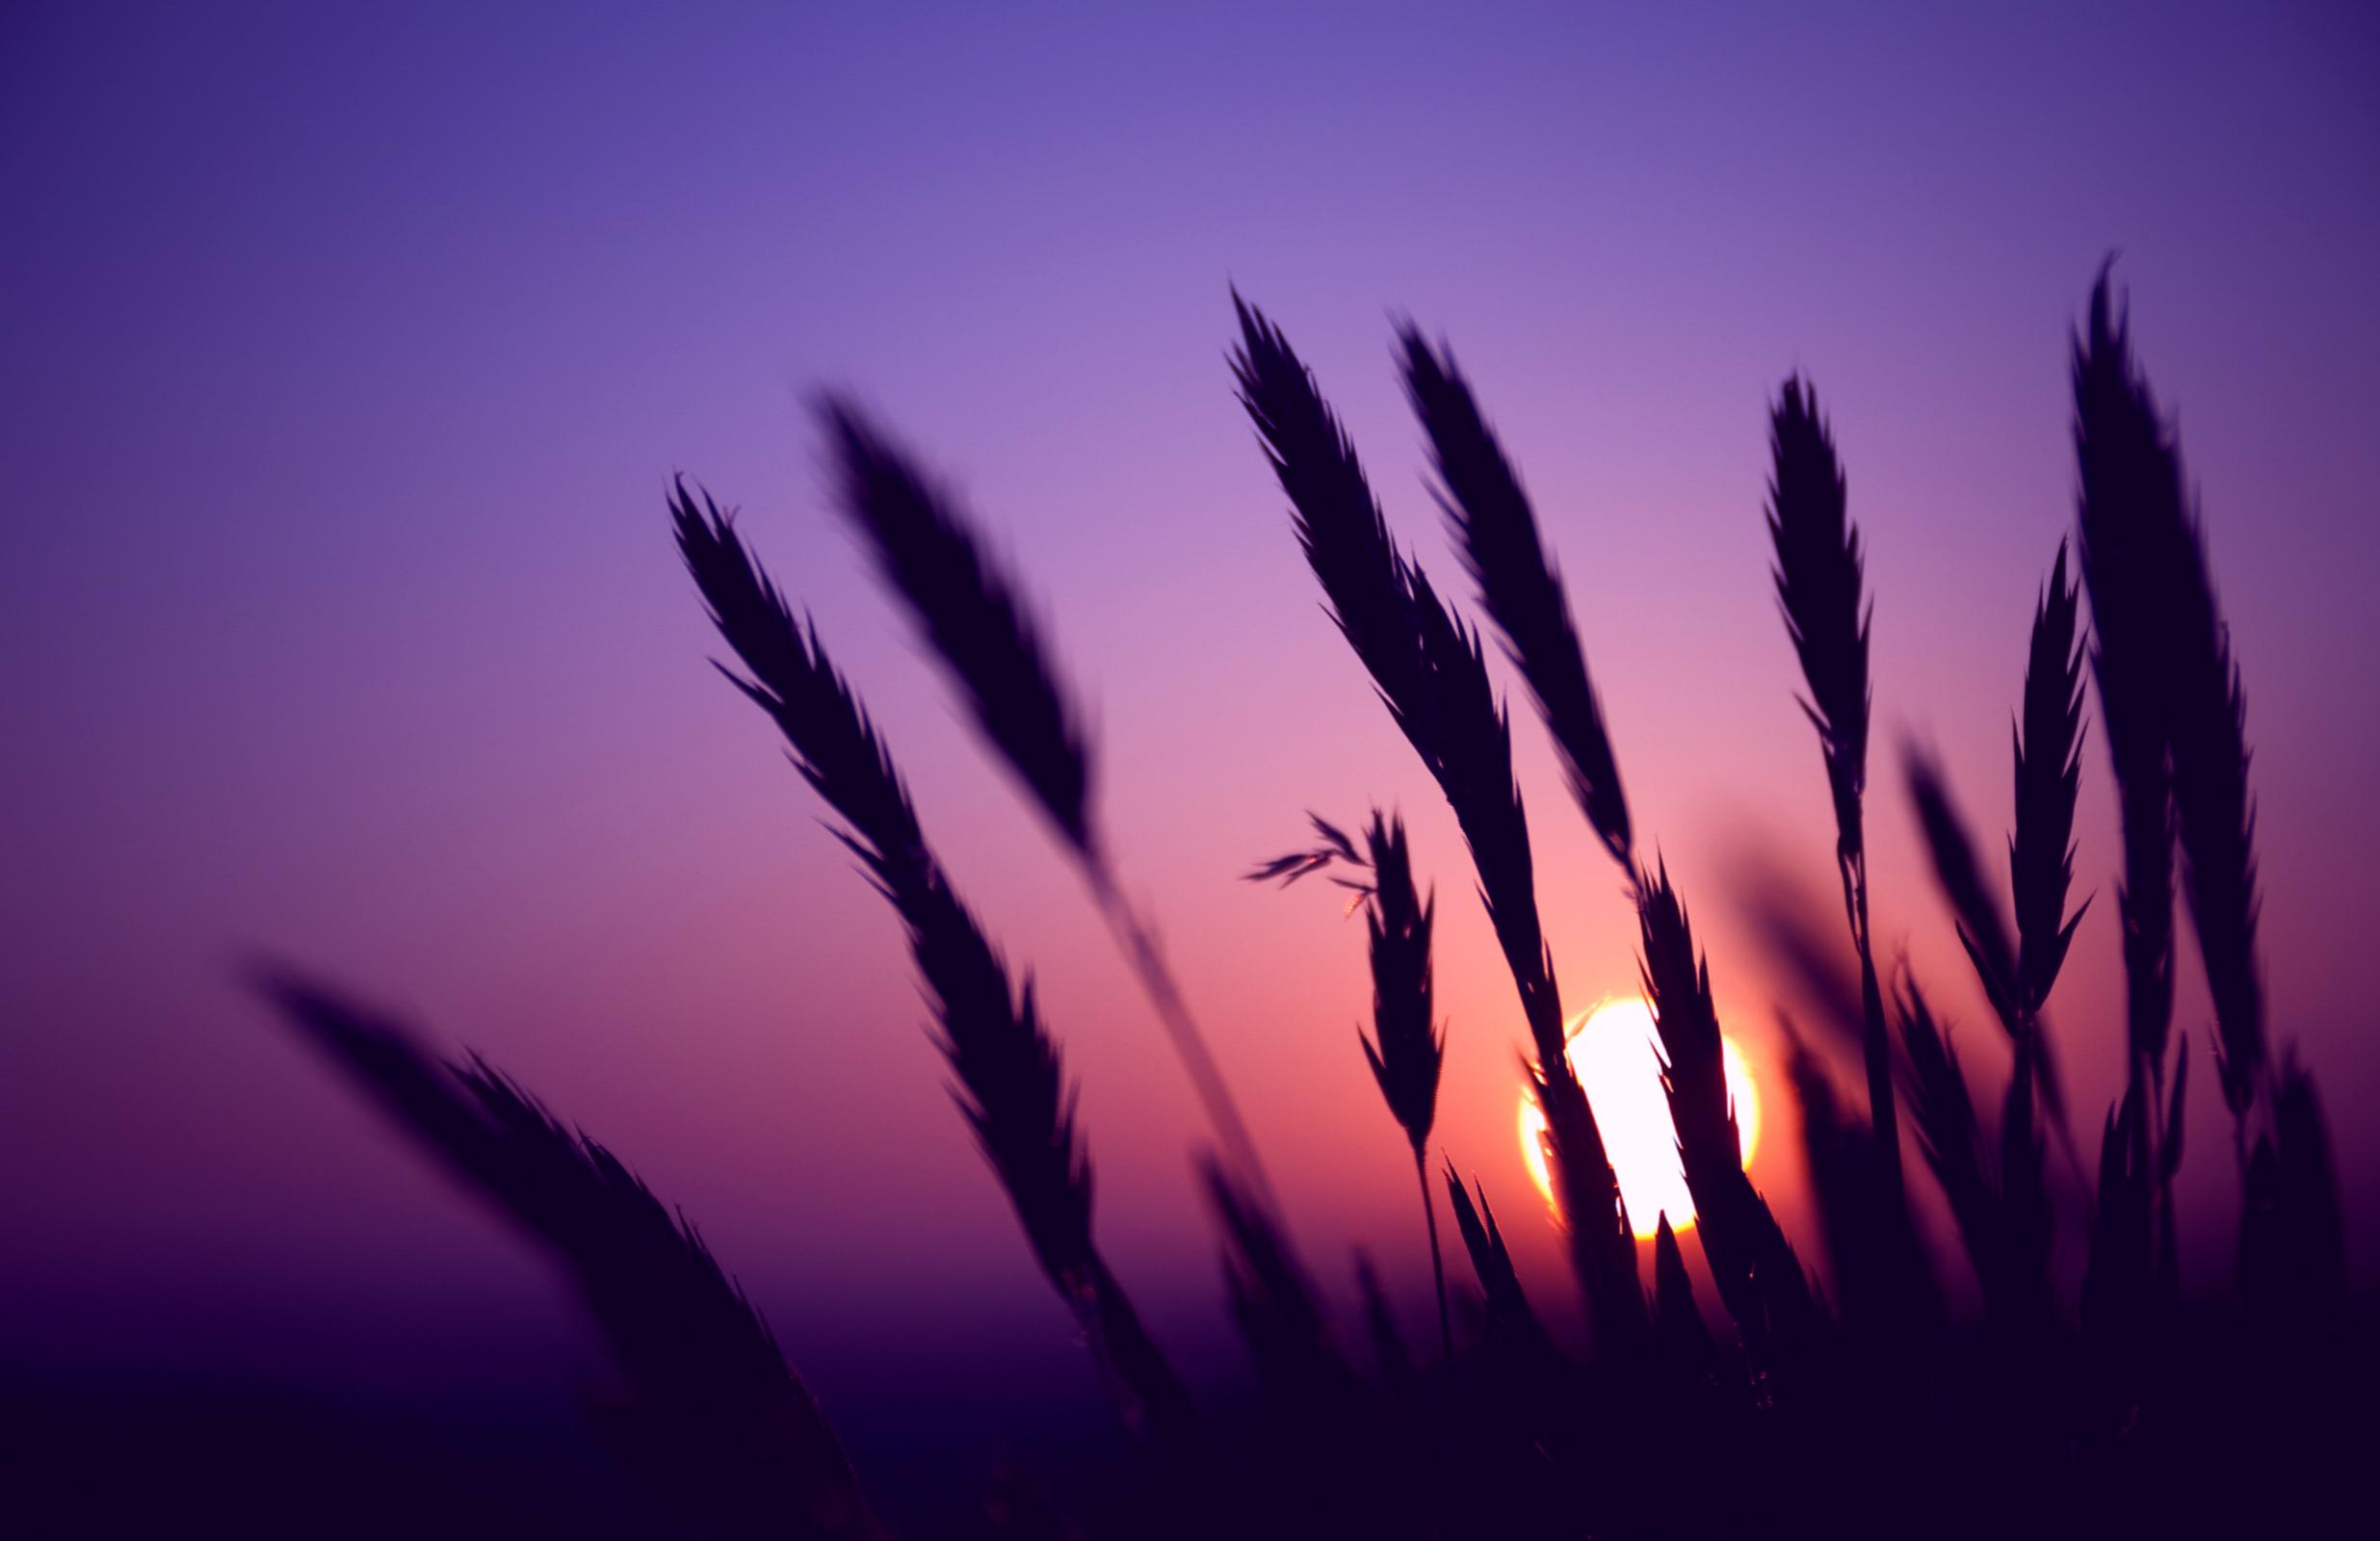 purple sunset wallpaper hd